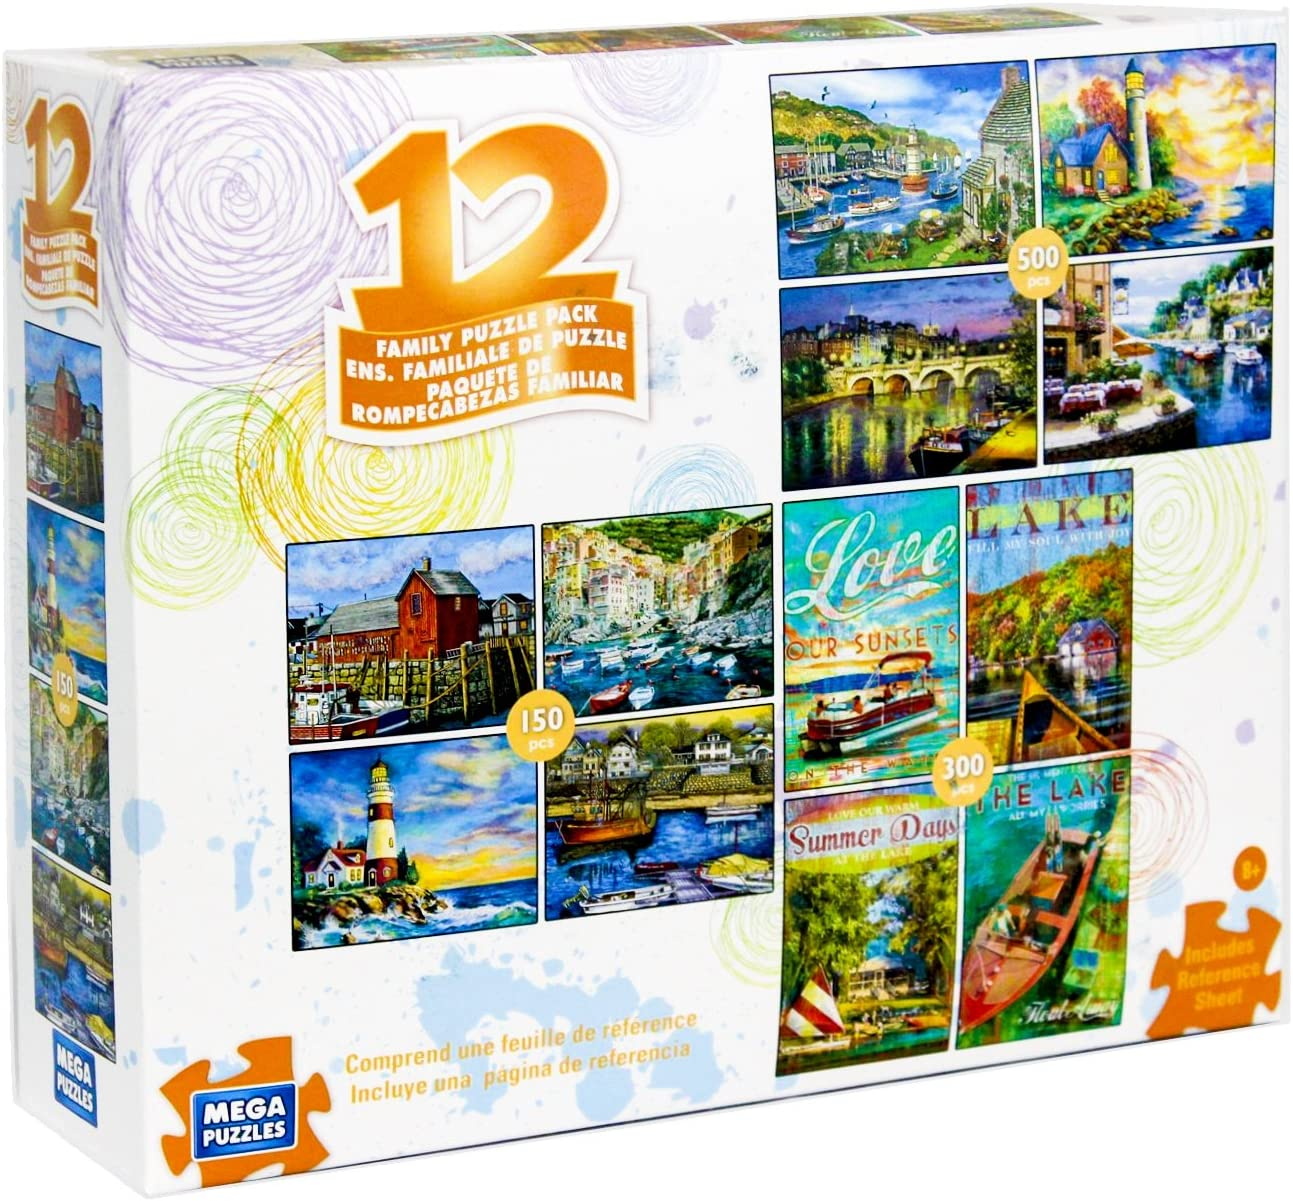 MEGA PUZZLES 300 Large Piece Jigsaw